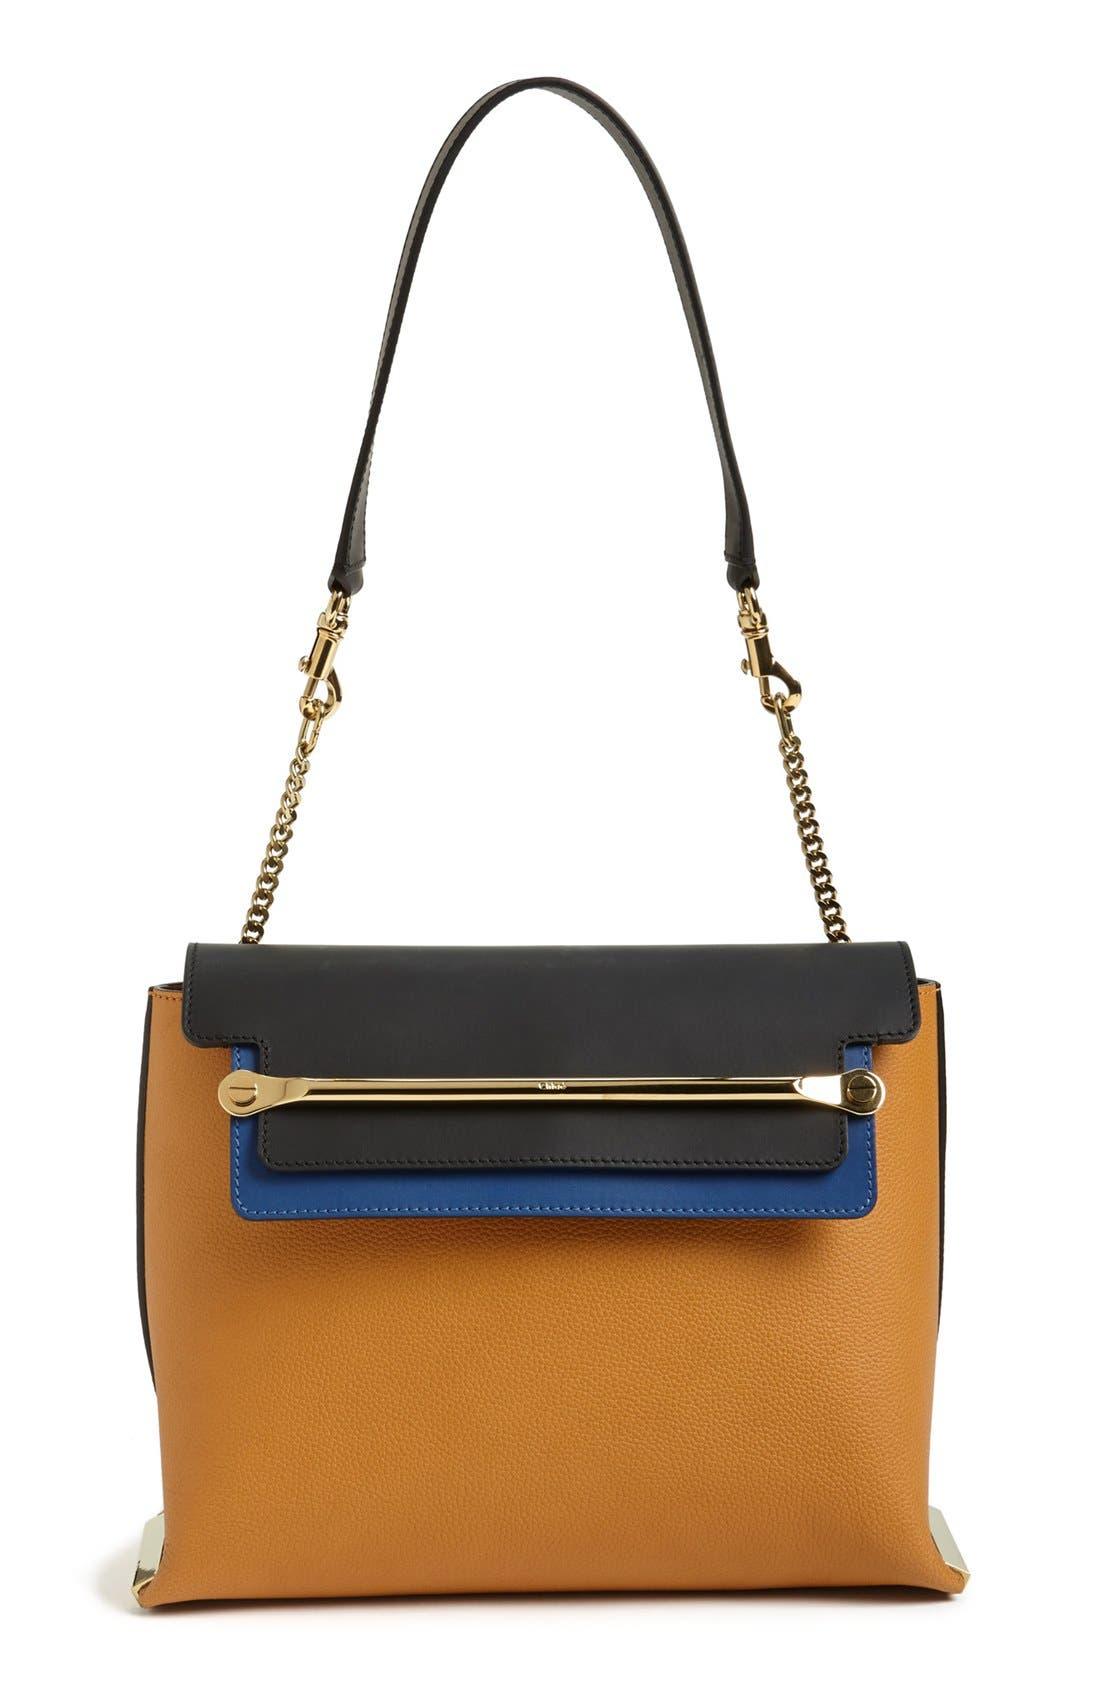 Main Image - Chloé 'Clare' Tricolor Leather Shoulder Bag